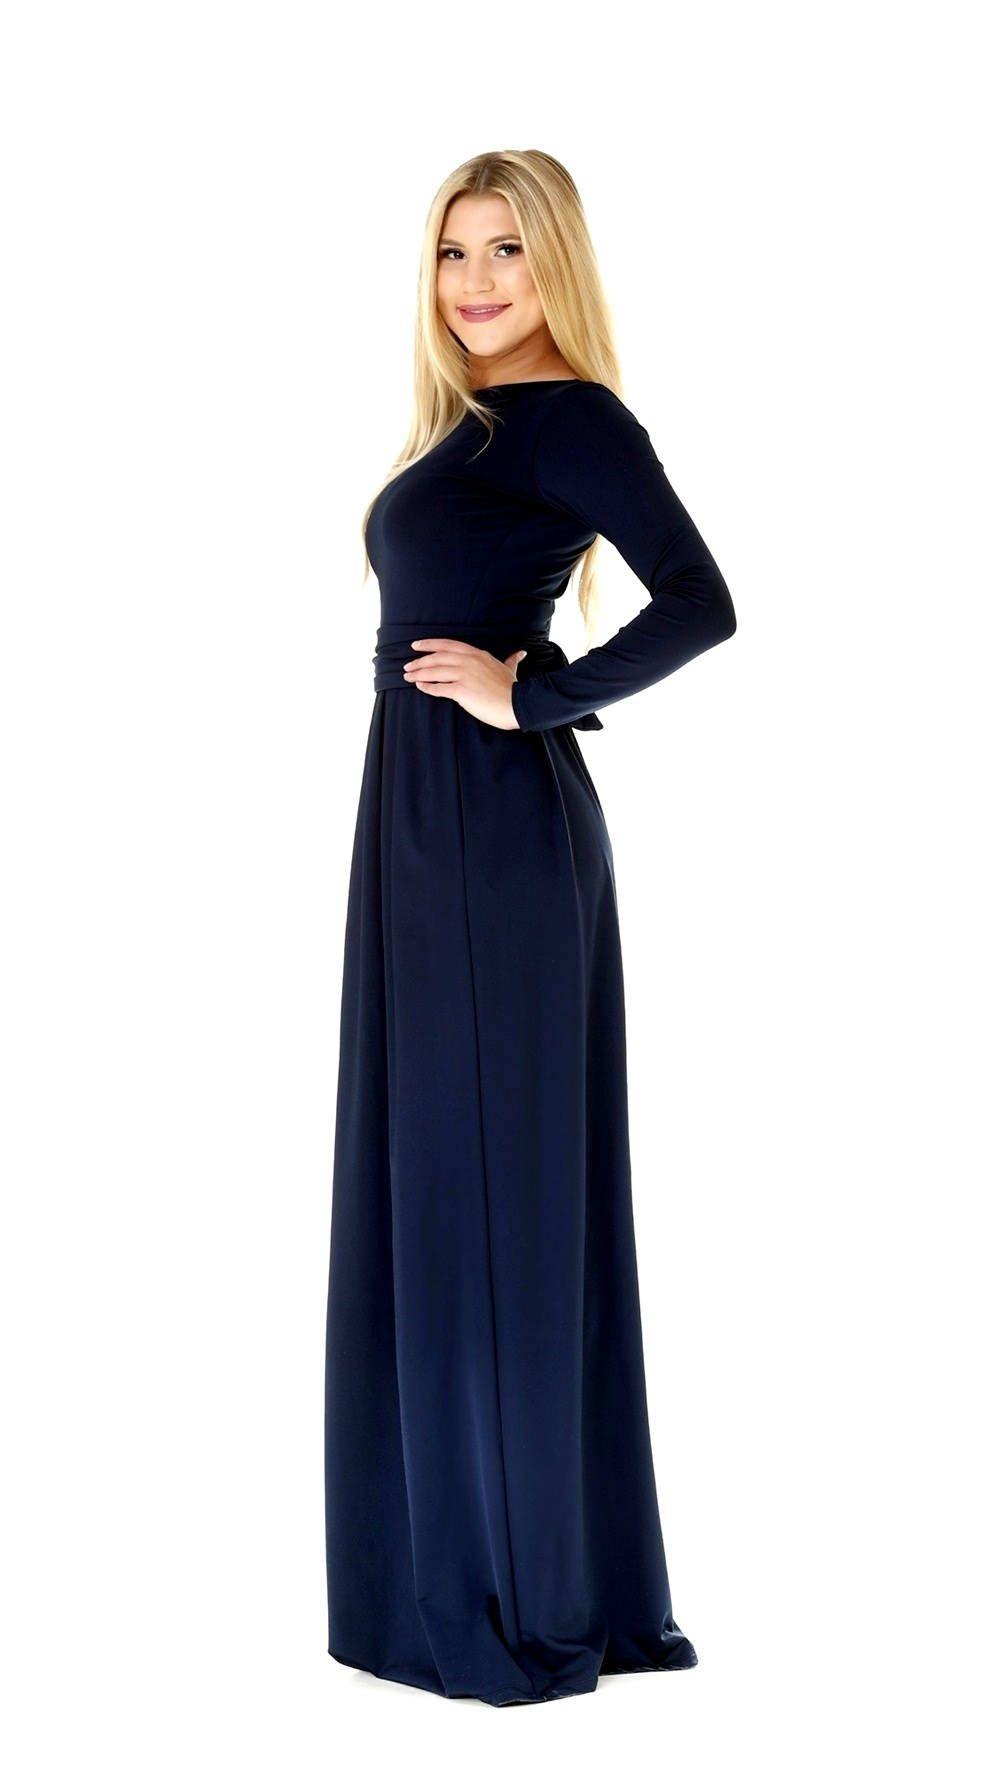 eb4c1b3bba7 Navy Blue Maxi Dress/ Long Sleeves Dress With Pockets Sash in 2019 ...